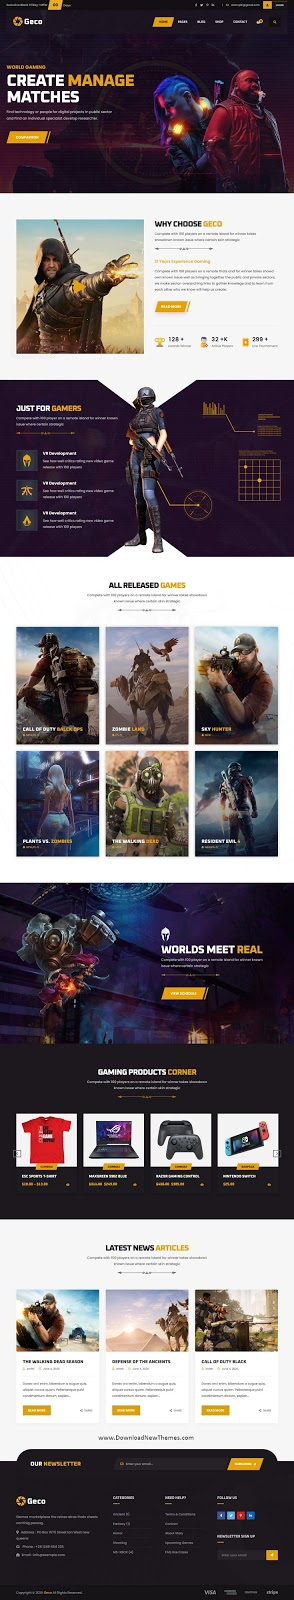 Best eSports and Gaming WordPress Theme